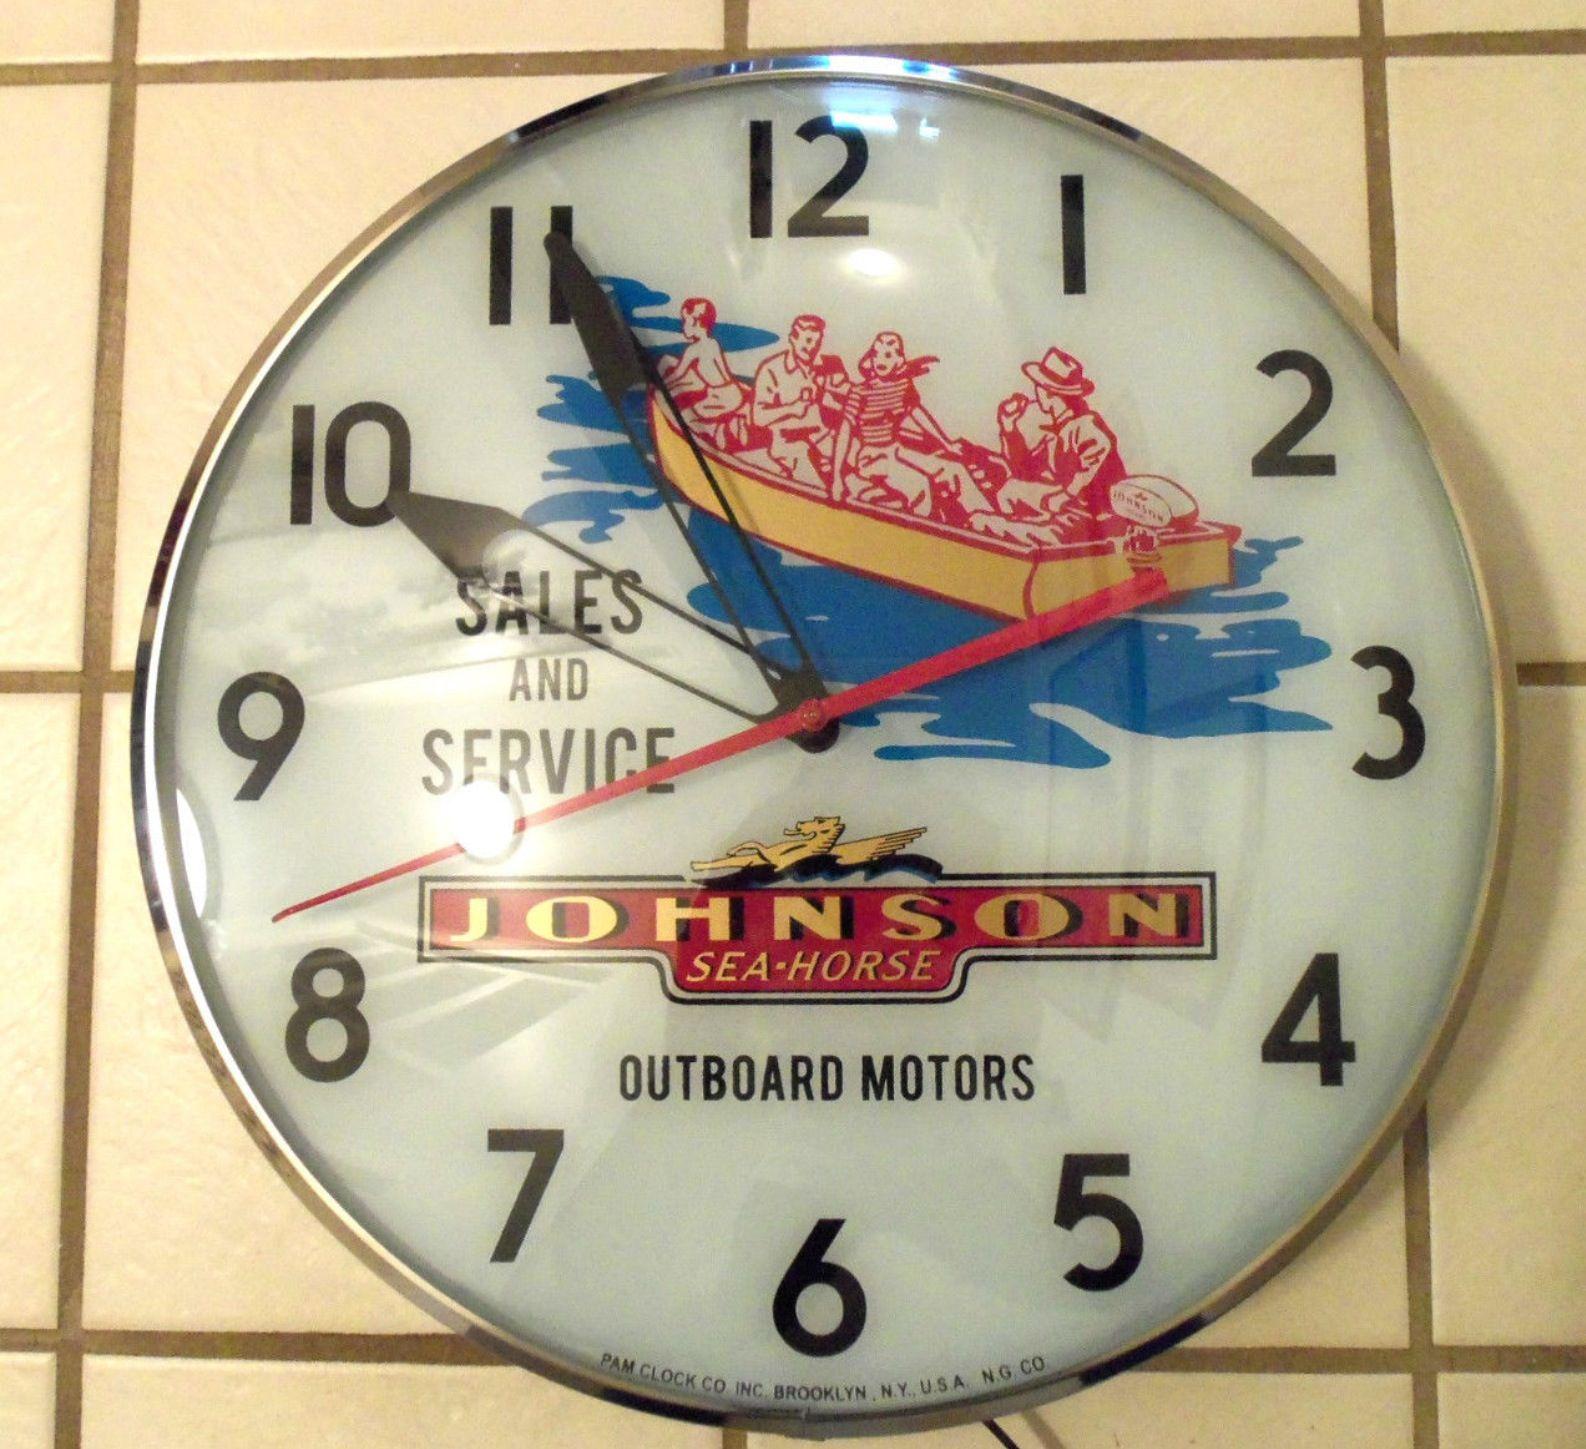 Johnson Seahorse Outboard Motors Clock Nautical Clocks